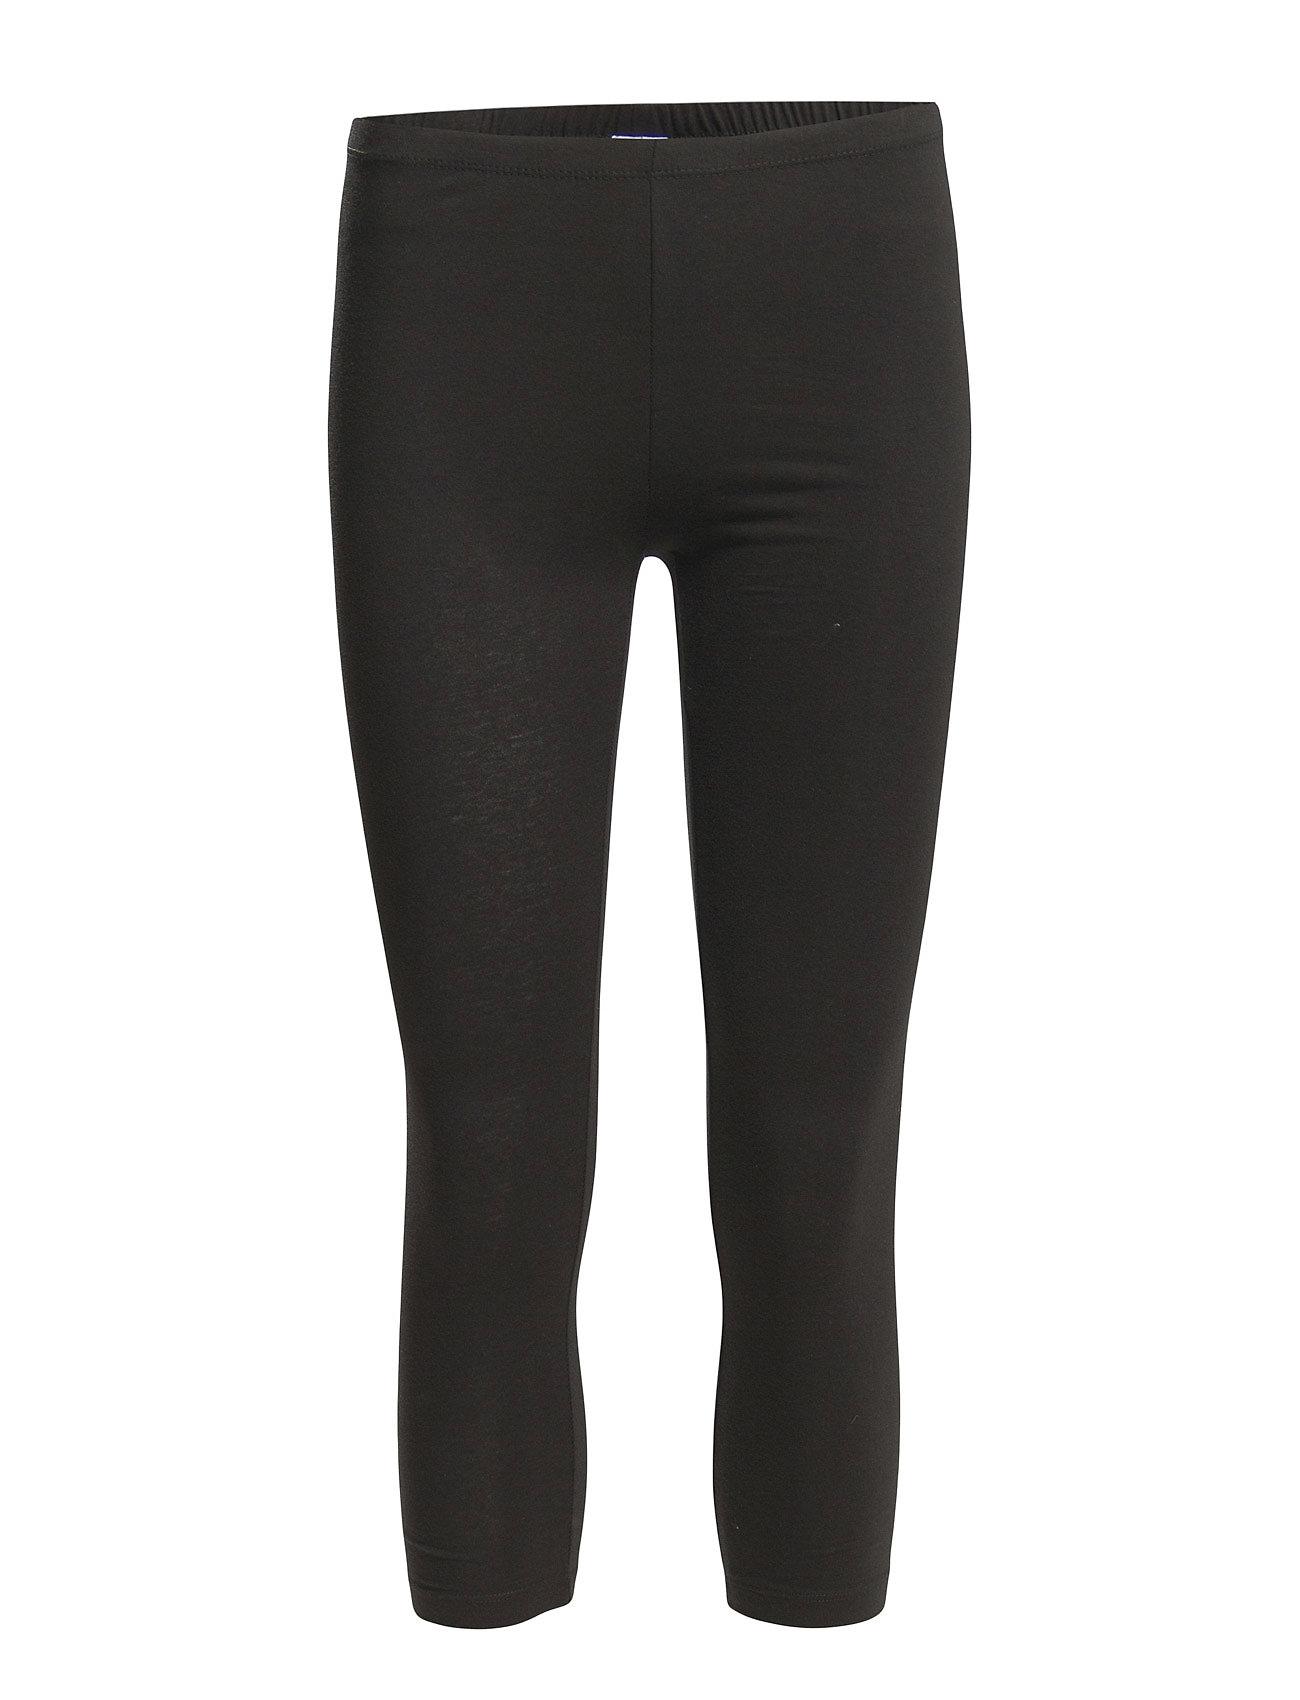 Decoy Dame capri leggings - BLACK